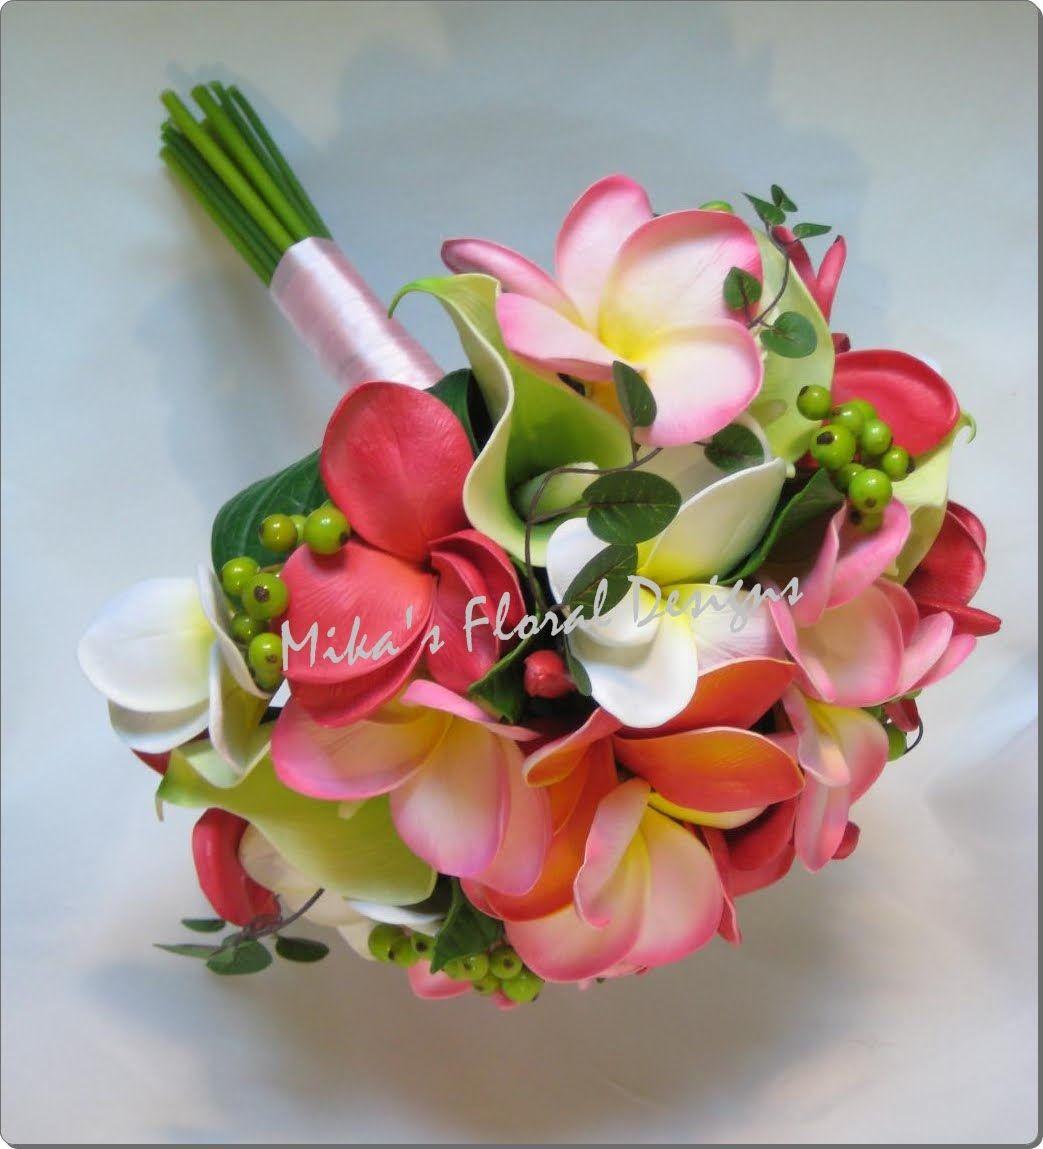 Wedding flower ideas australia on wedding flowers and bouquets wedding flower ideas australia on wedding flowers and bouquets australia frangipani artificial wedding izmirmasajfo